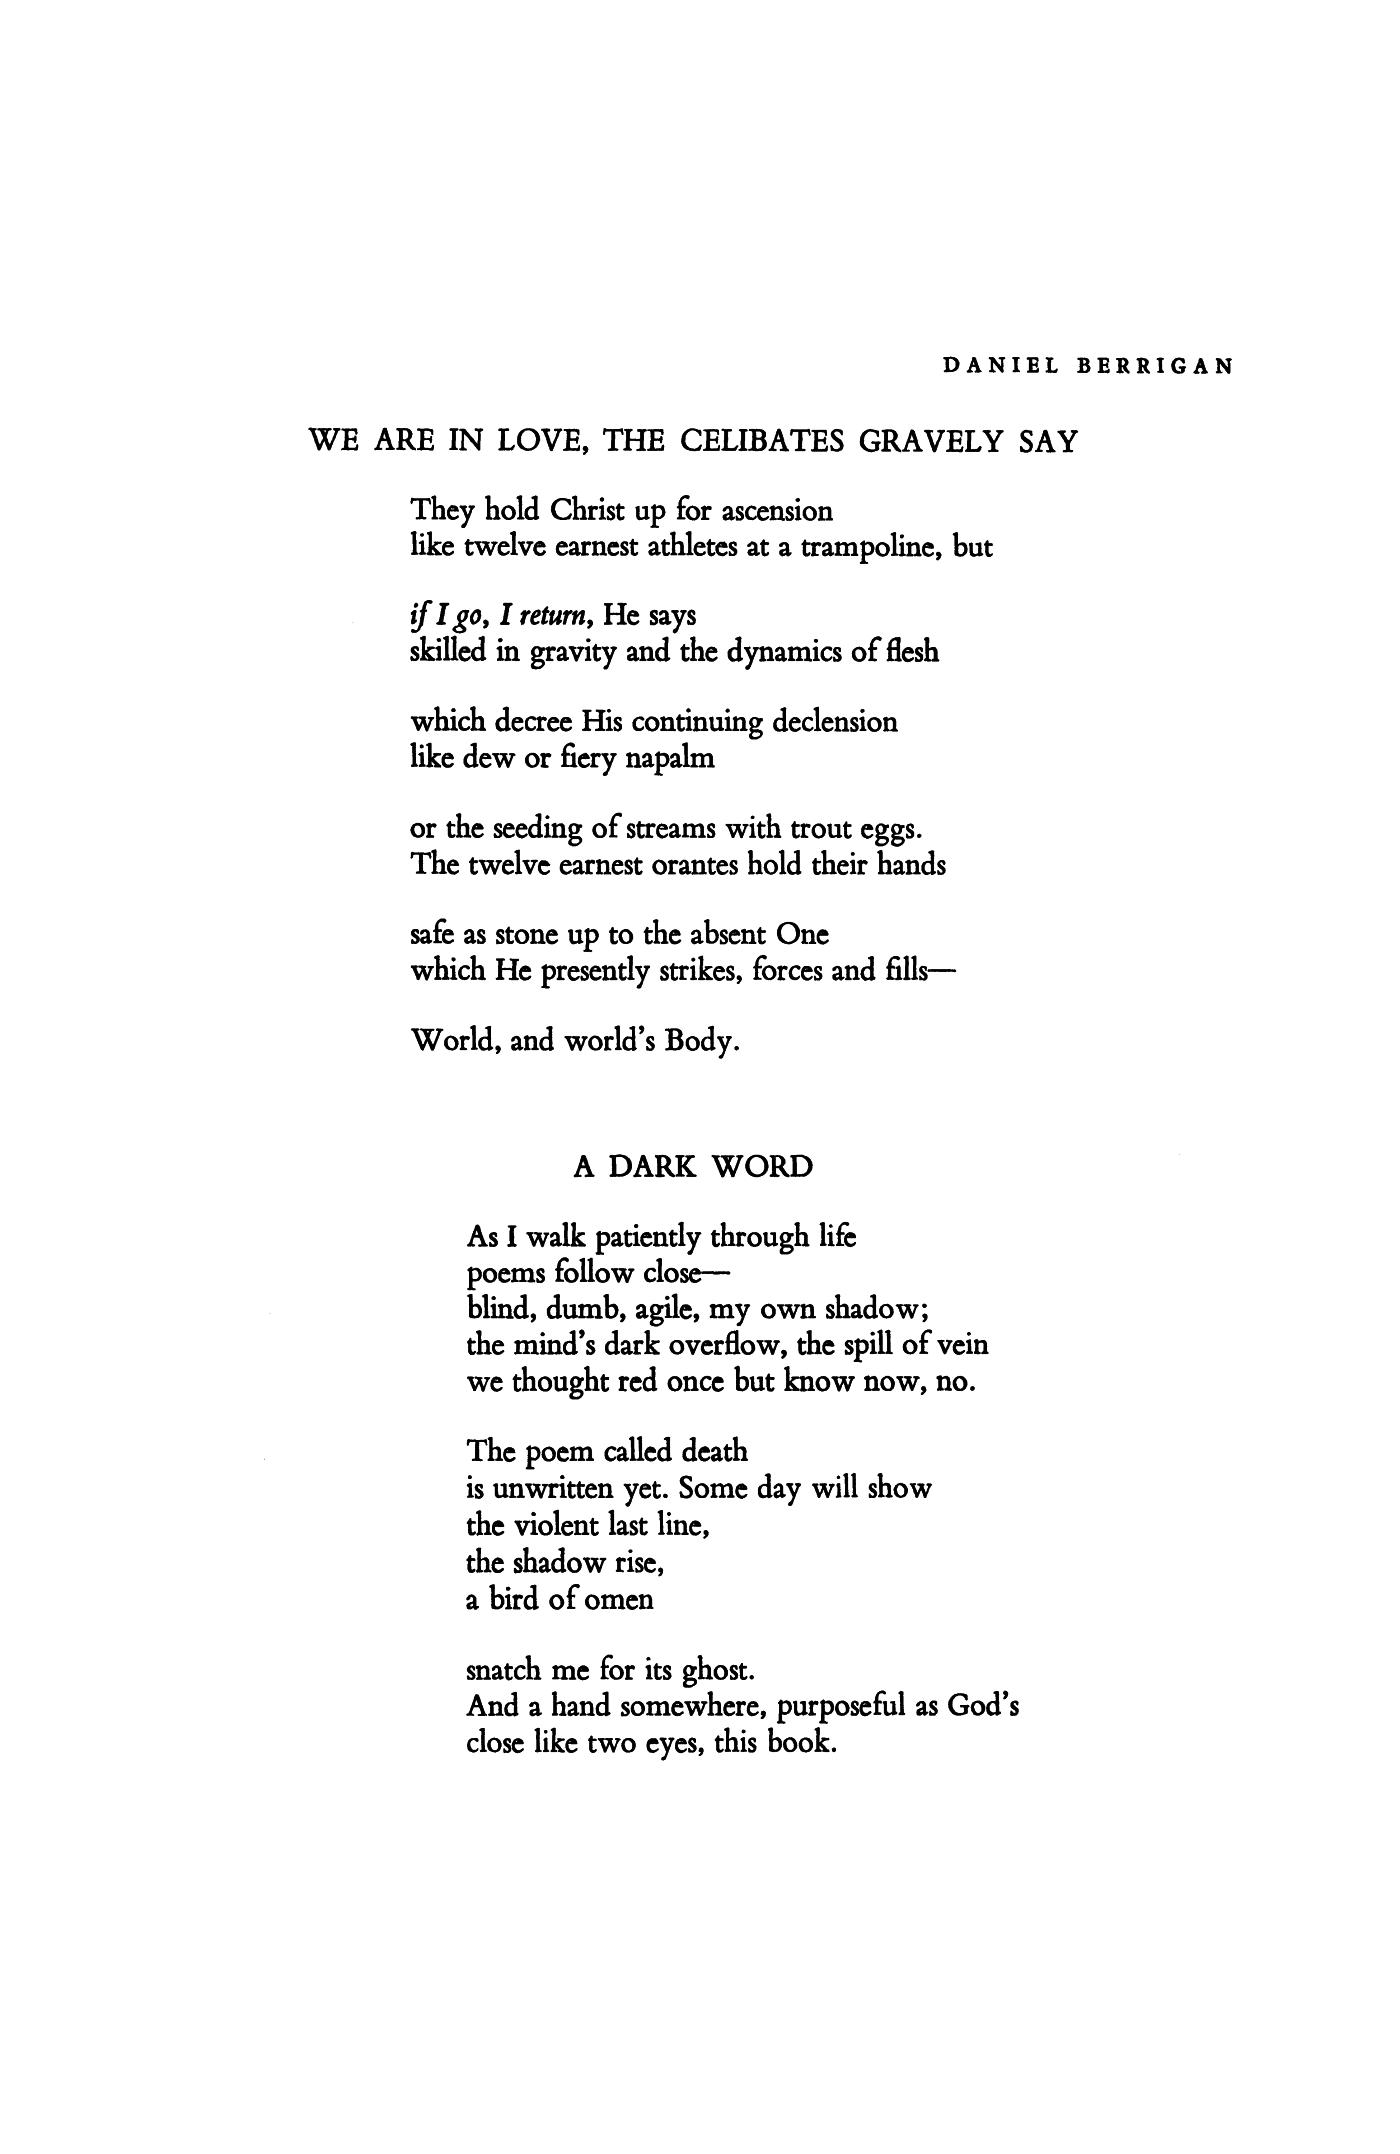 We Are in Love, the Celibates Gravely Say by Daniel Berrigan